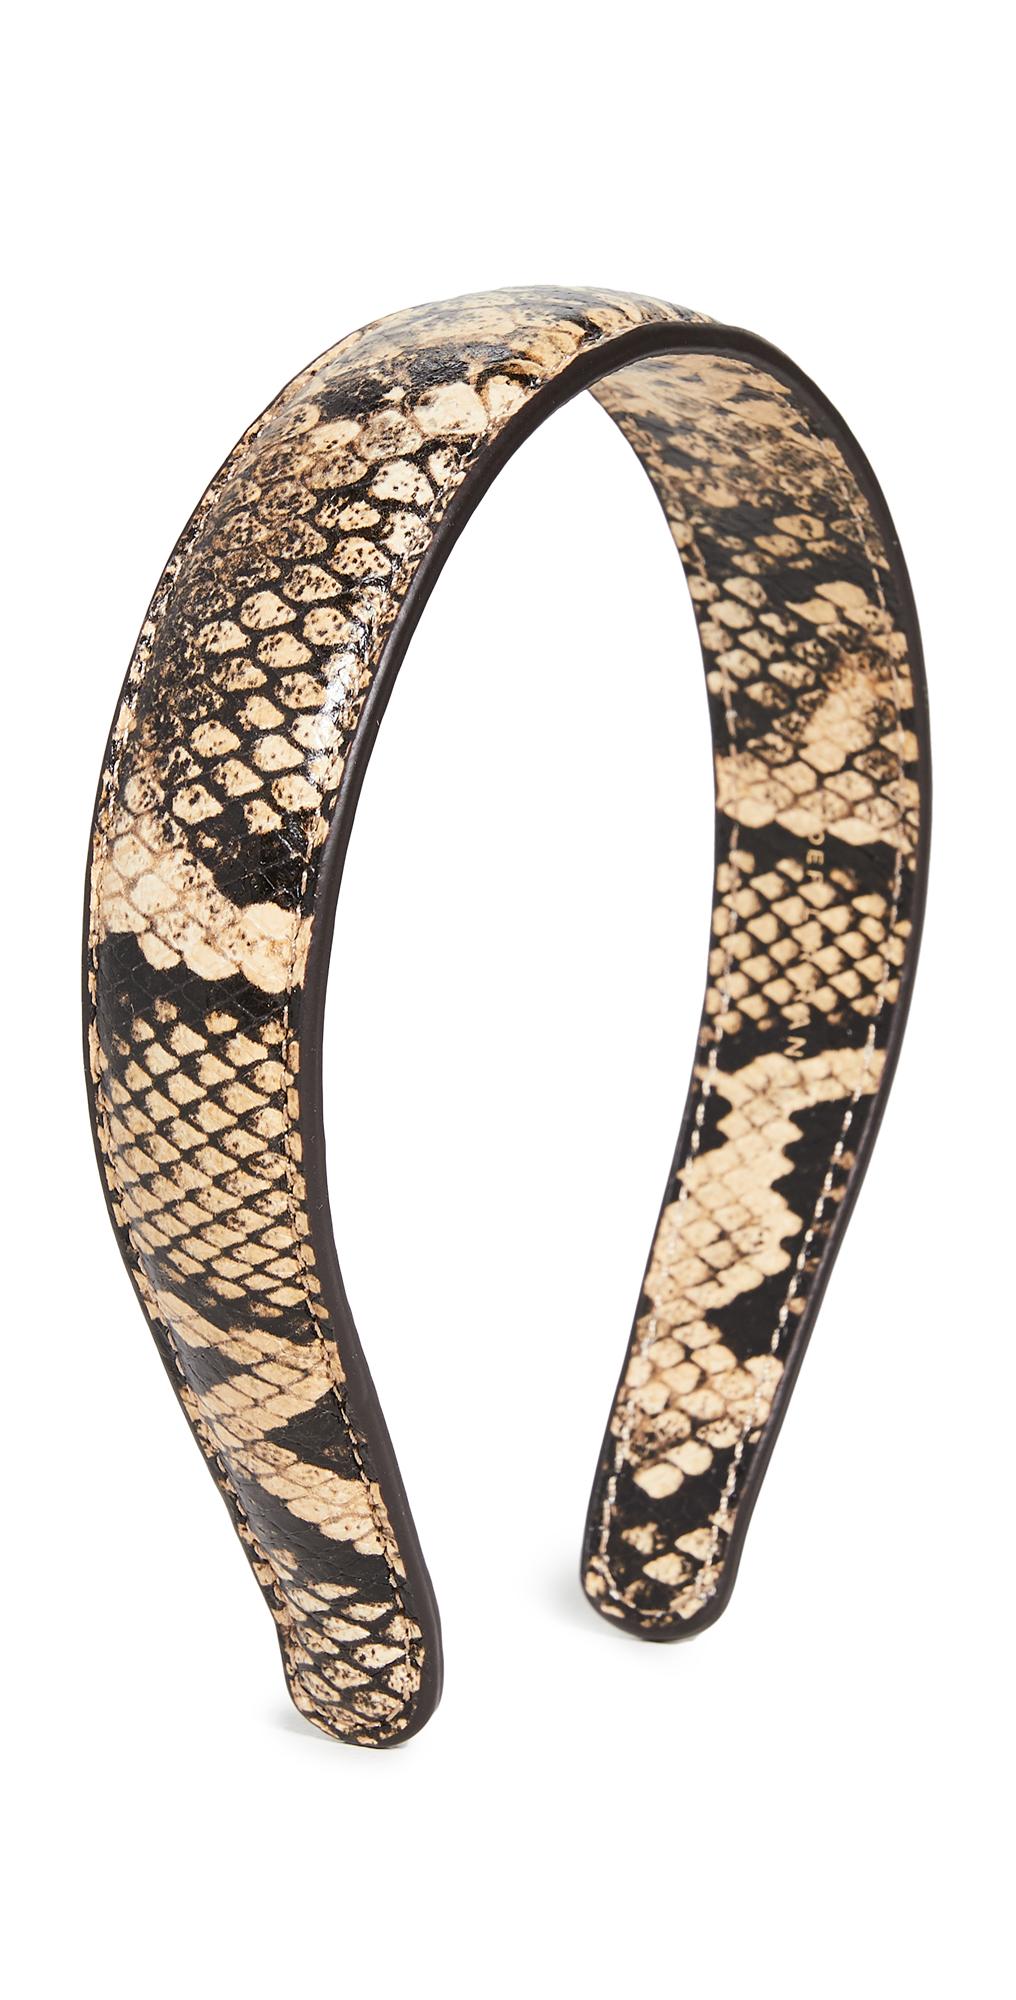 Loeffler Randall Leather Headband